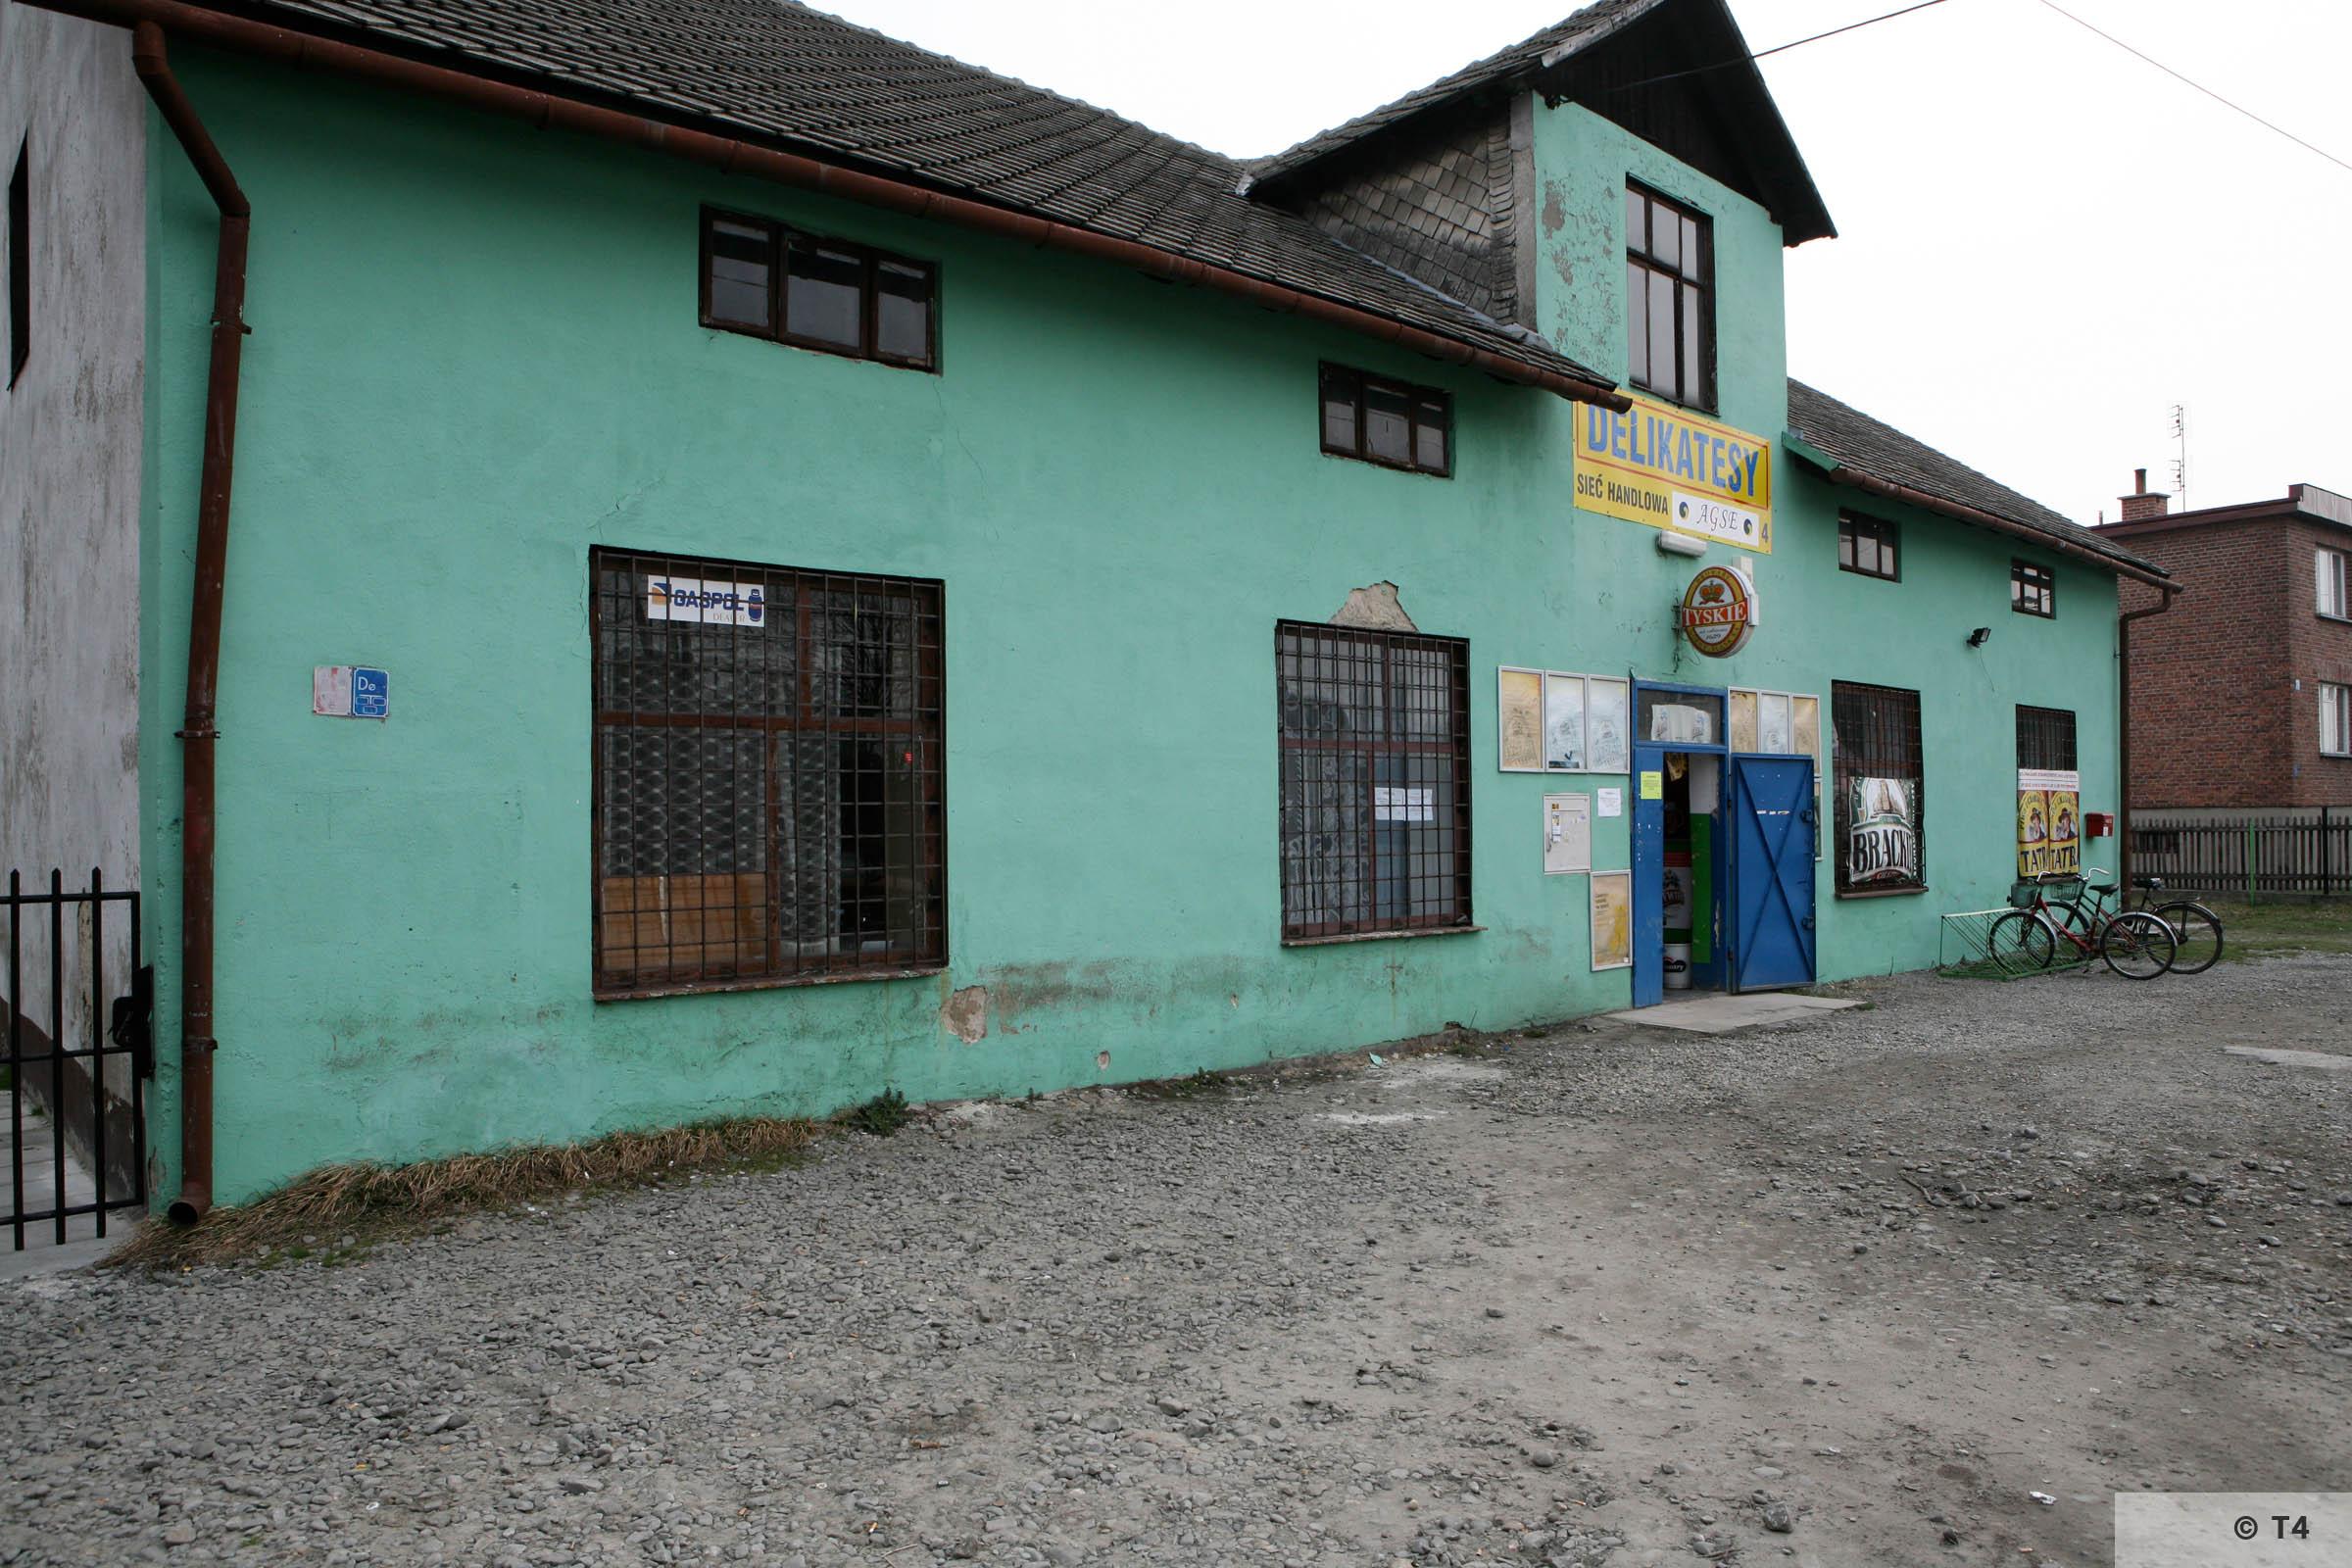 Former duck hatchery now a business premises. 2007 T4 3647